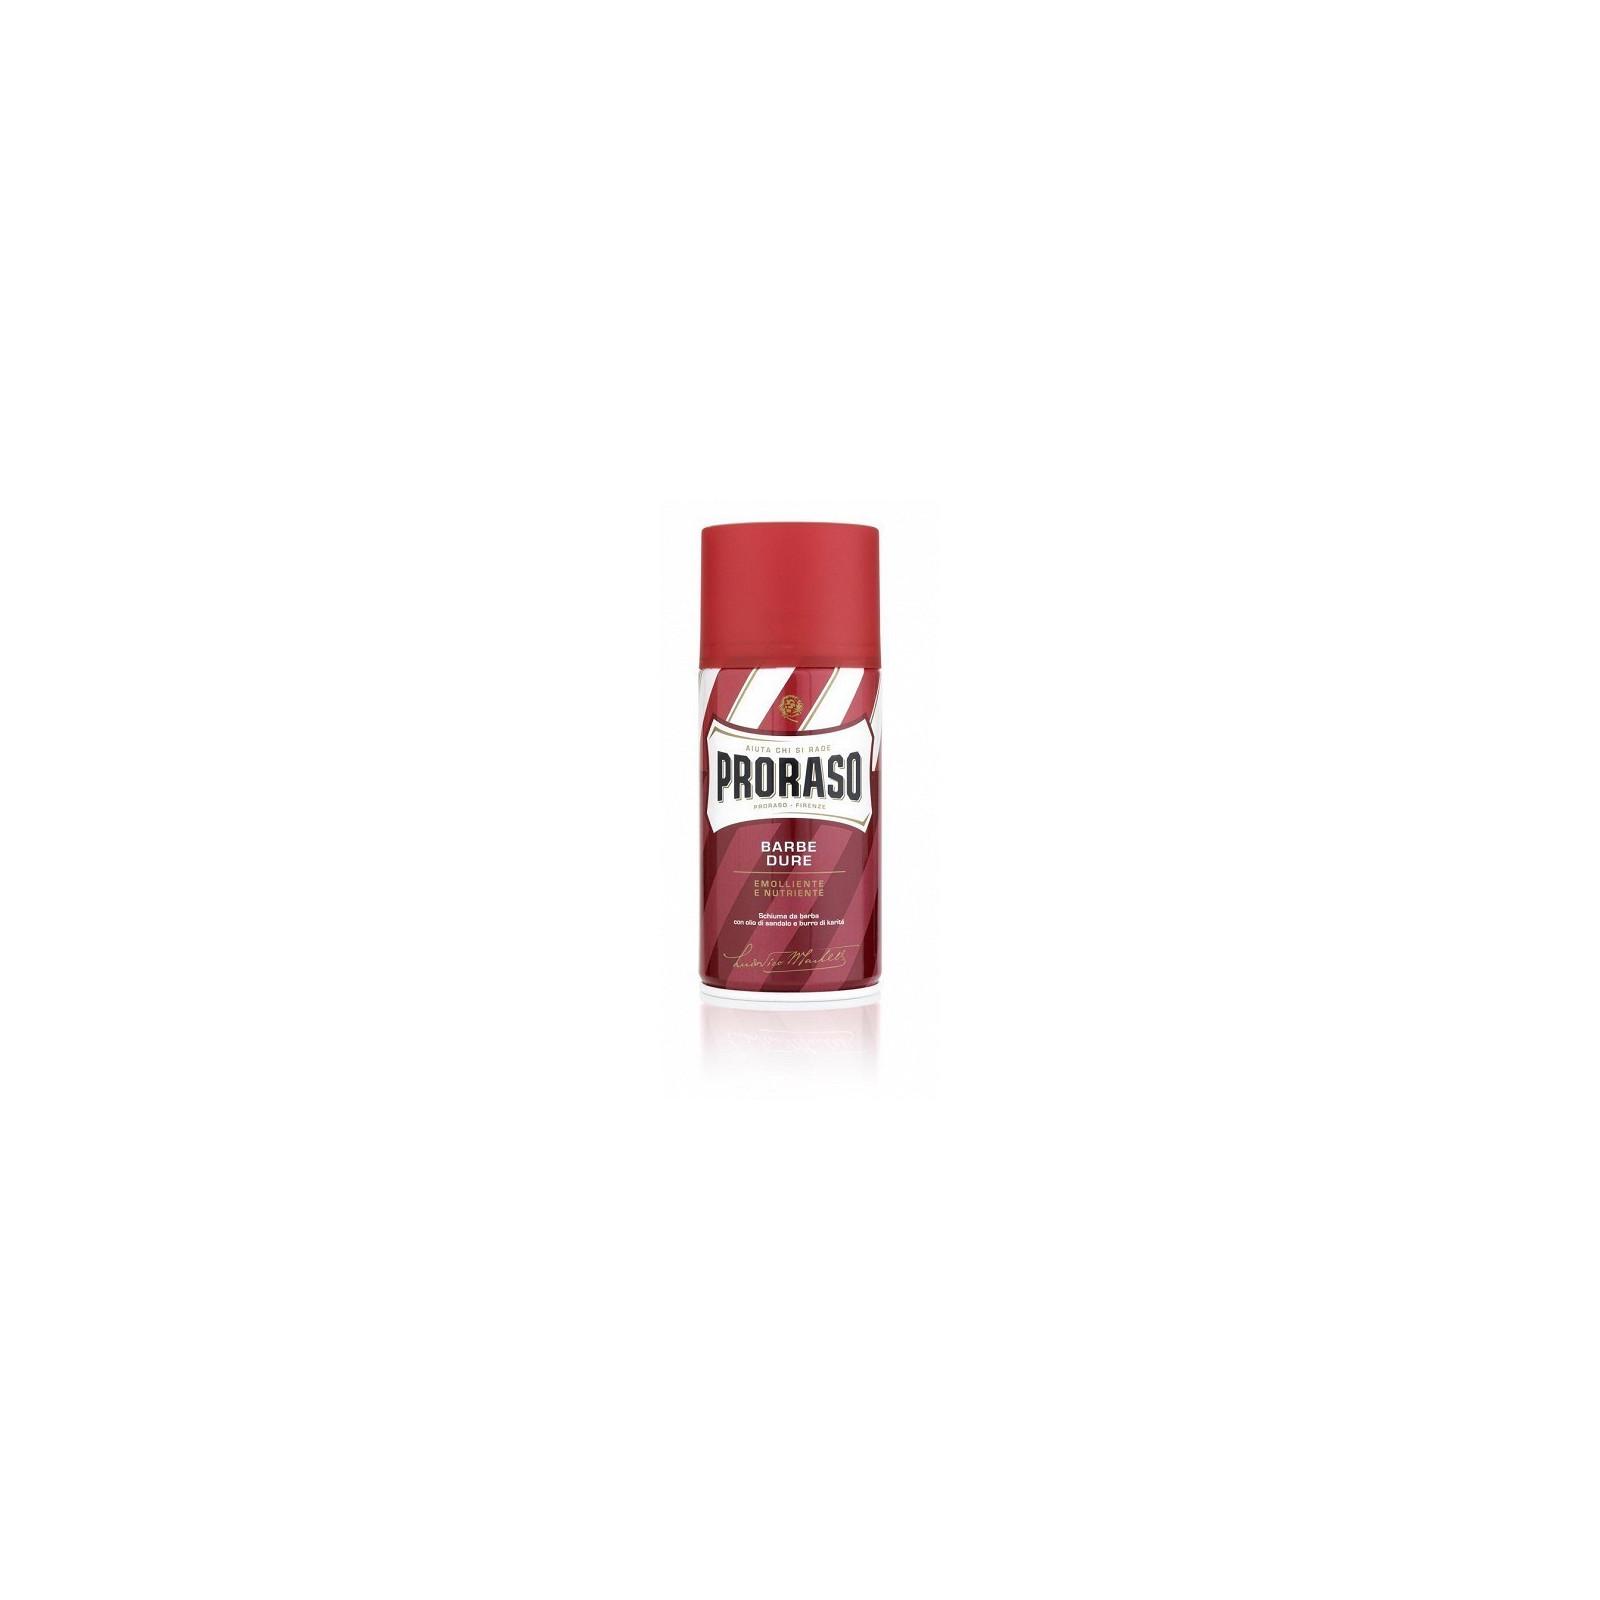 Petite Mousse de rasage Proraso rouge